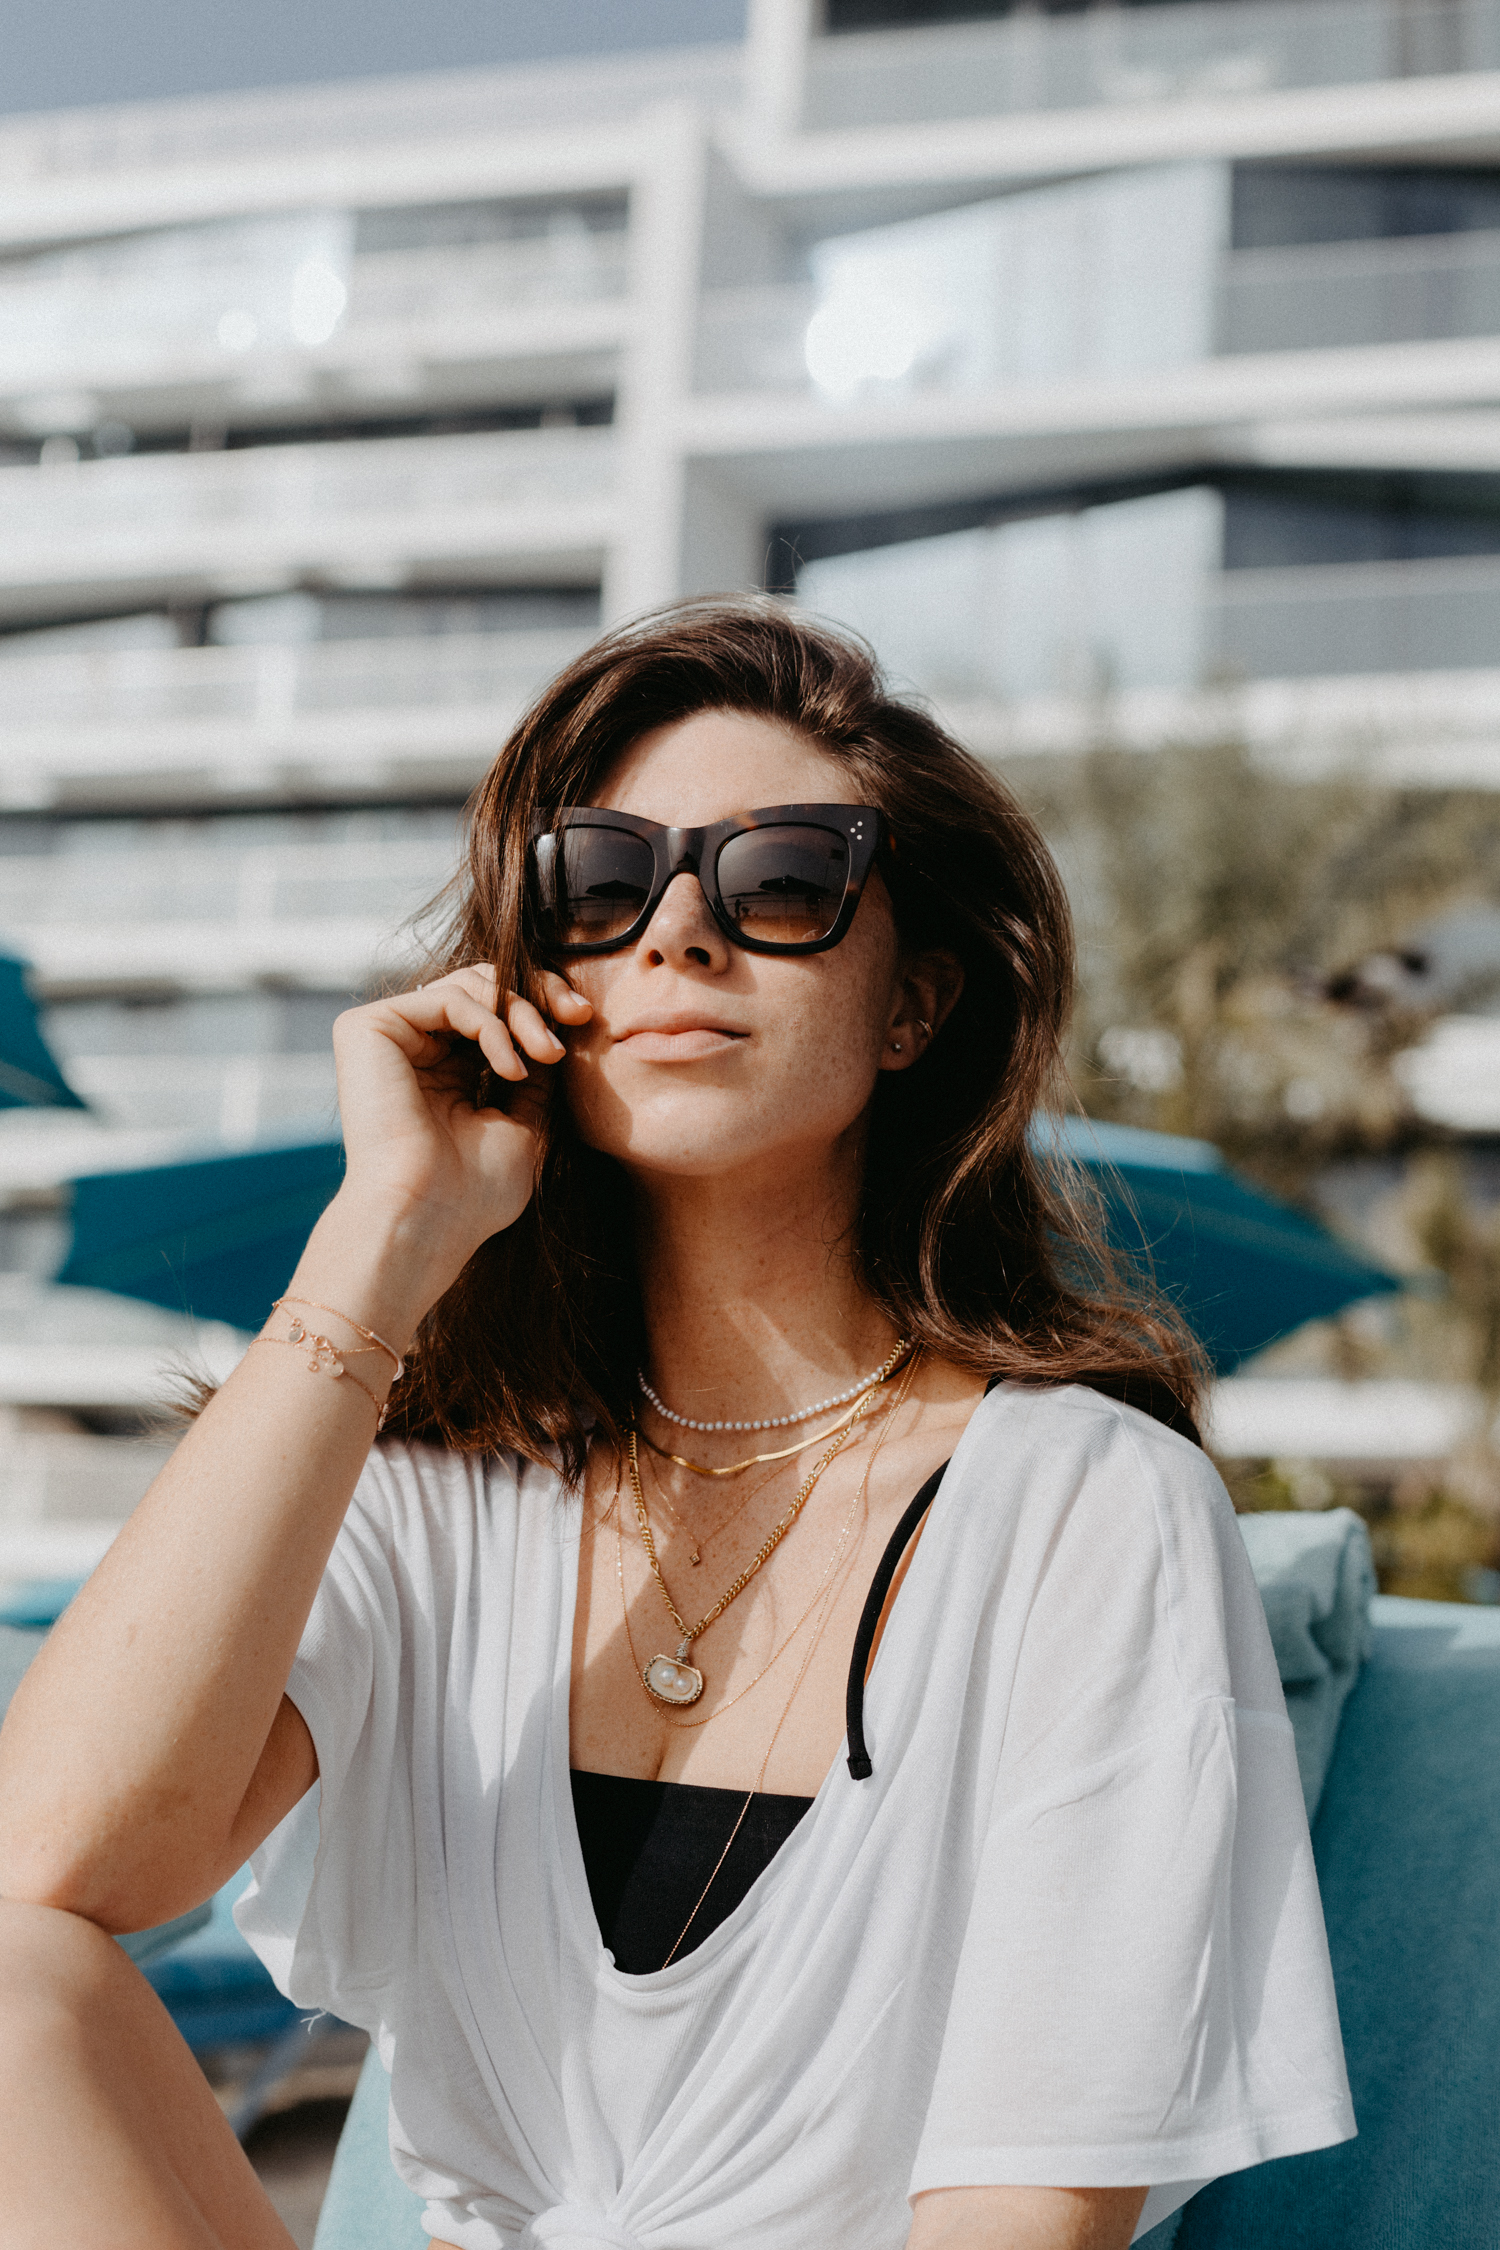 Mehrere Ketten Kombinieren: Necklace Layering - Love Daily Dose